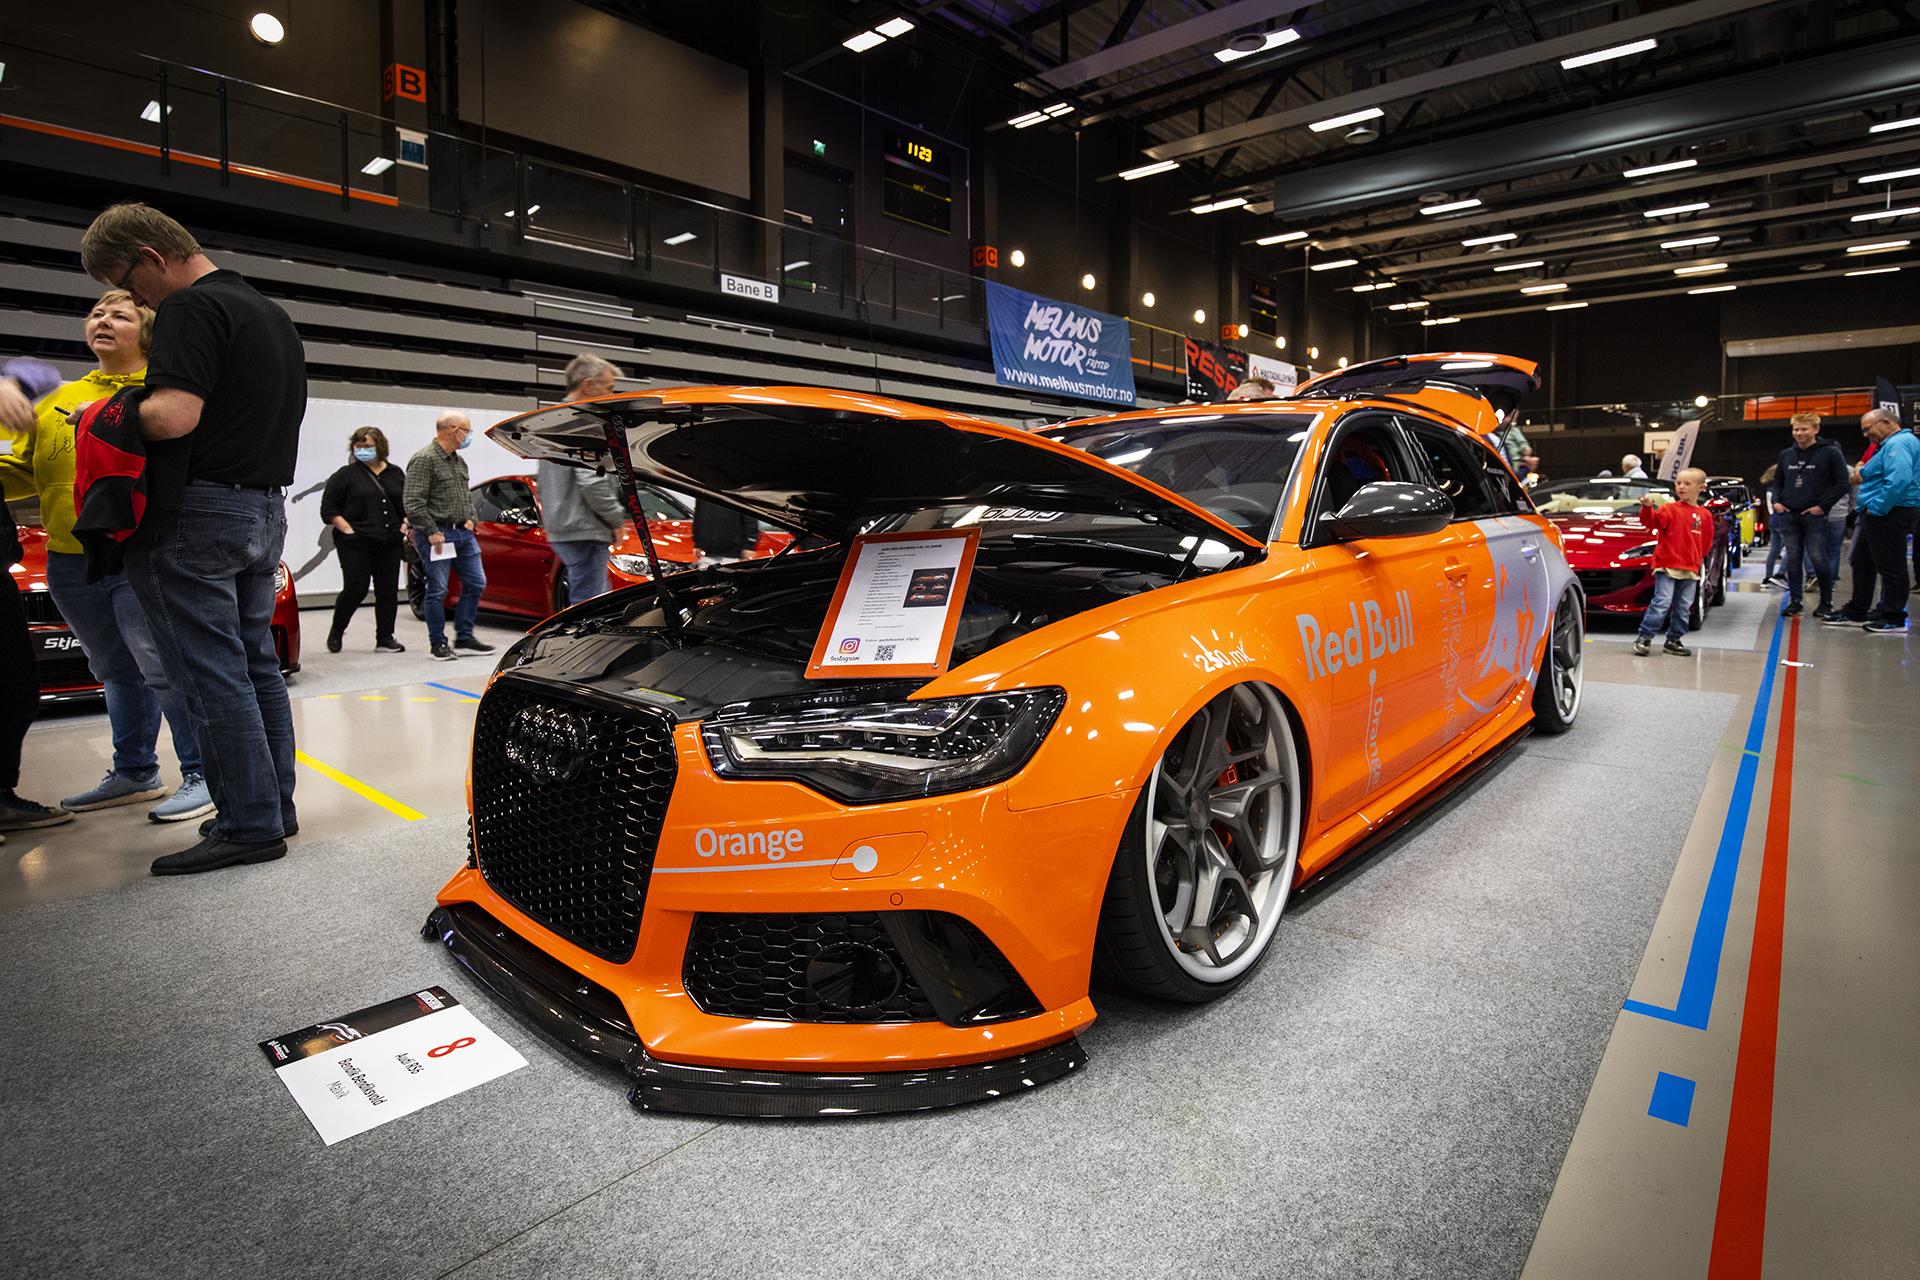 Bendik Bendiksvold har en lekker Audi RS6 med både race- og stance-stuk i en og samme bil!